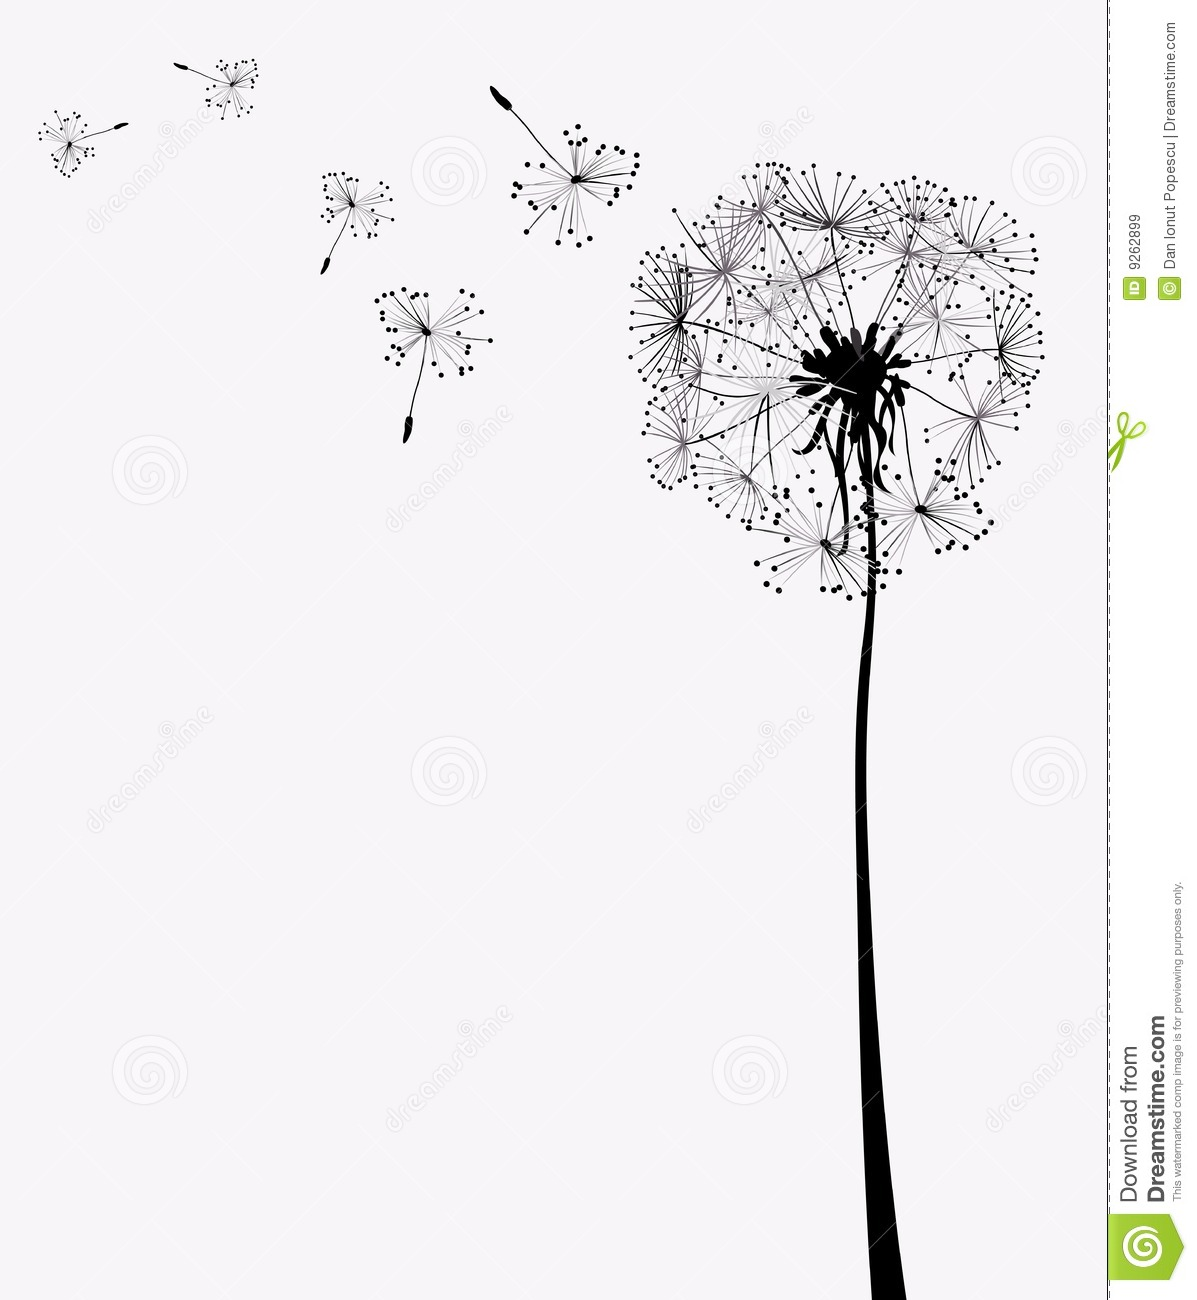 Clip Art Dandelion Fluff.